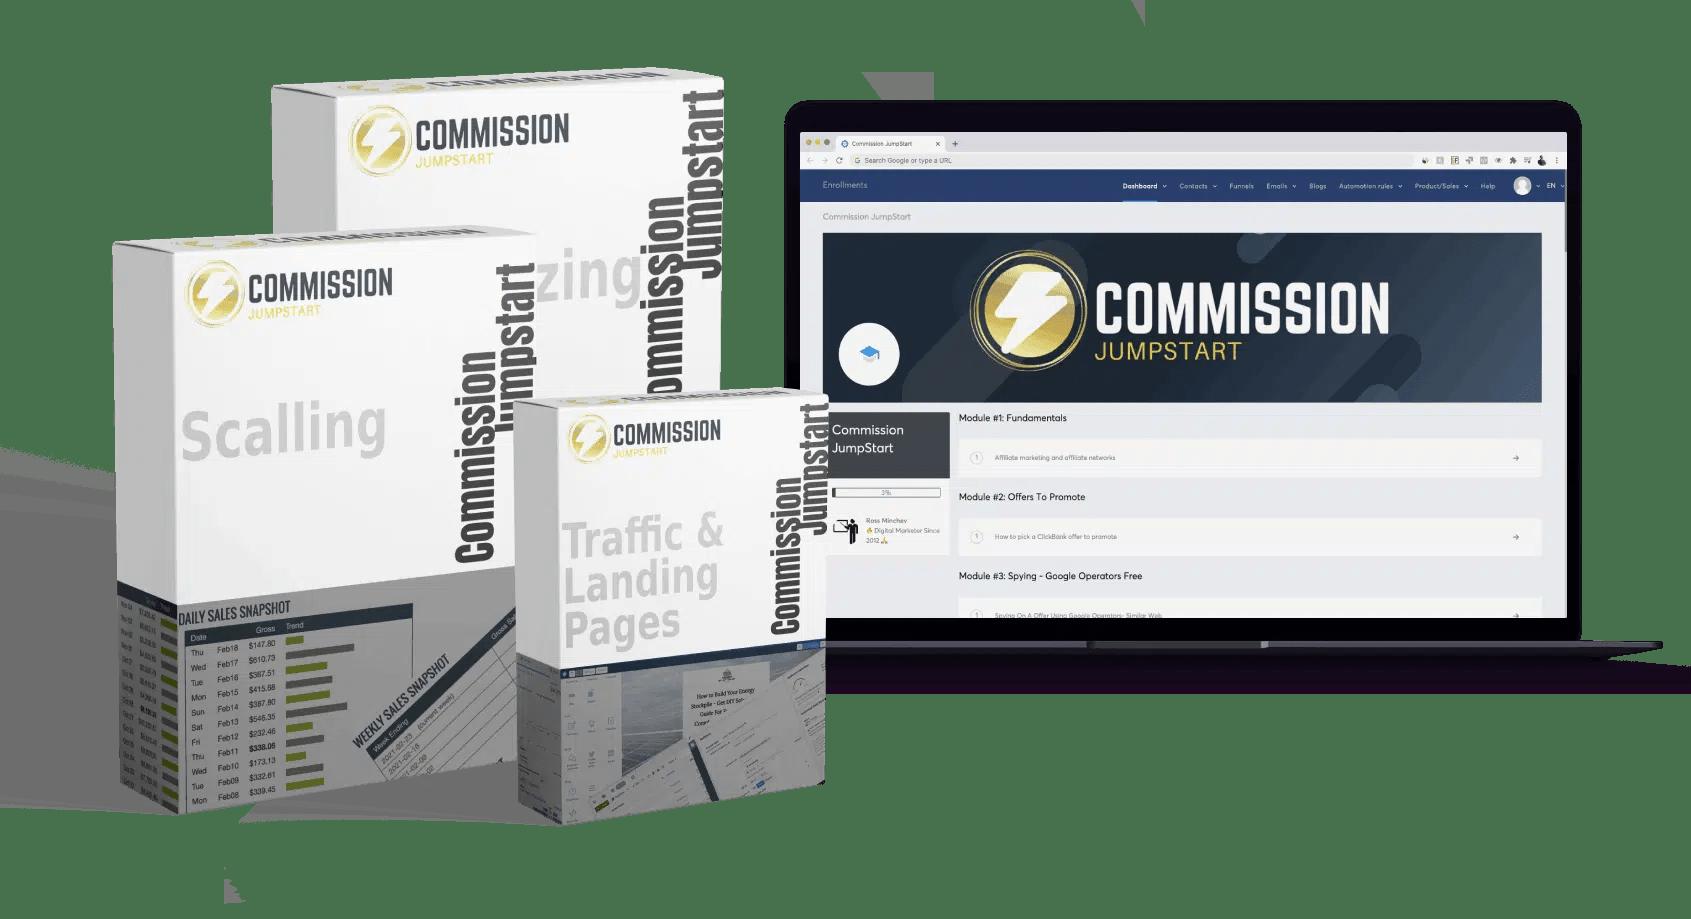 Ross Minchev – Commission JumpStart - GETWSODO